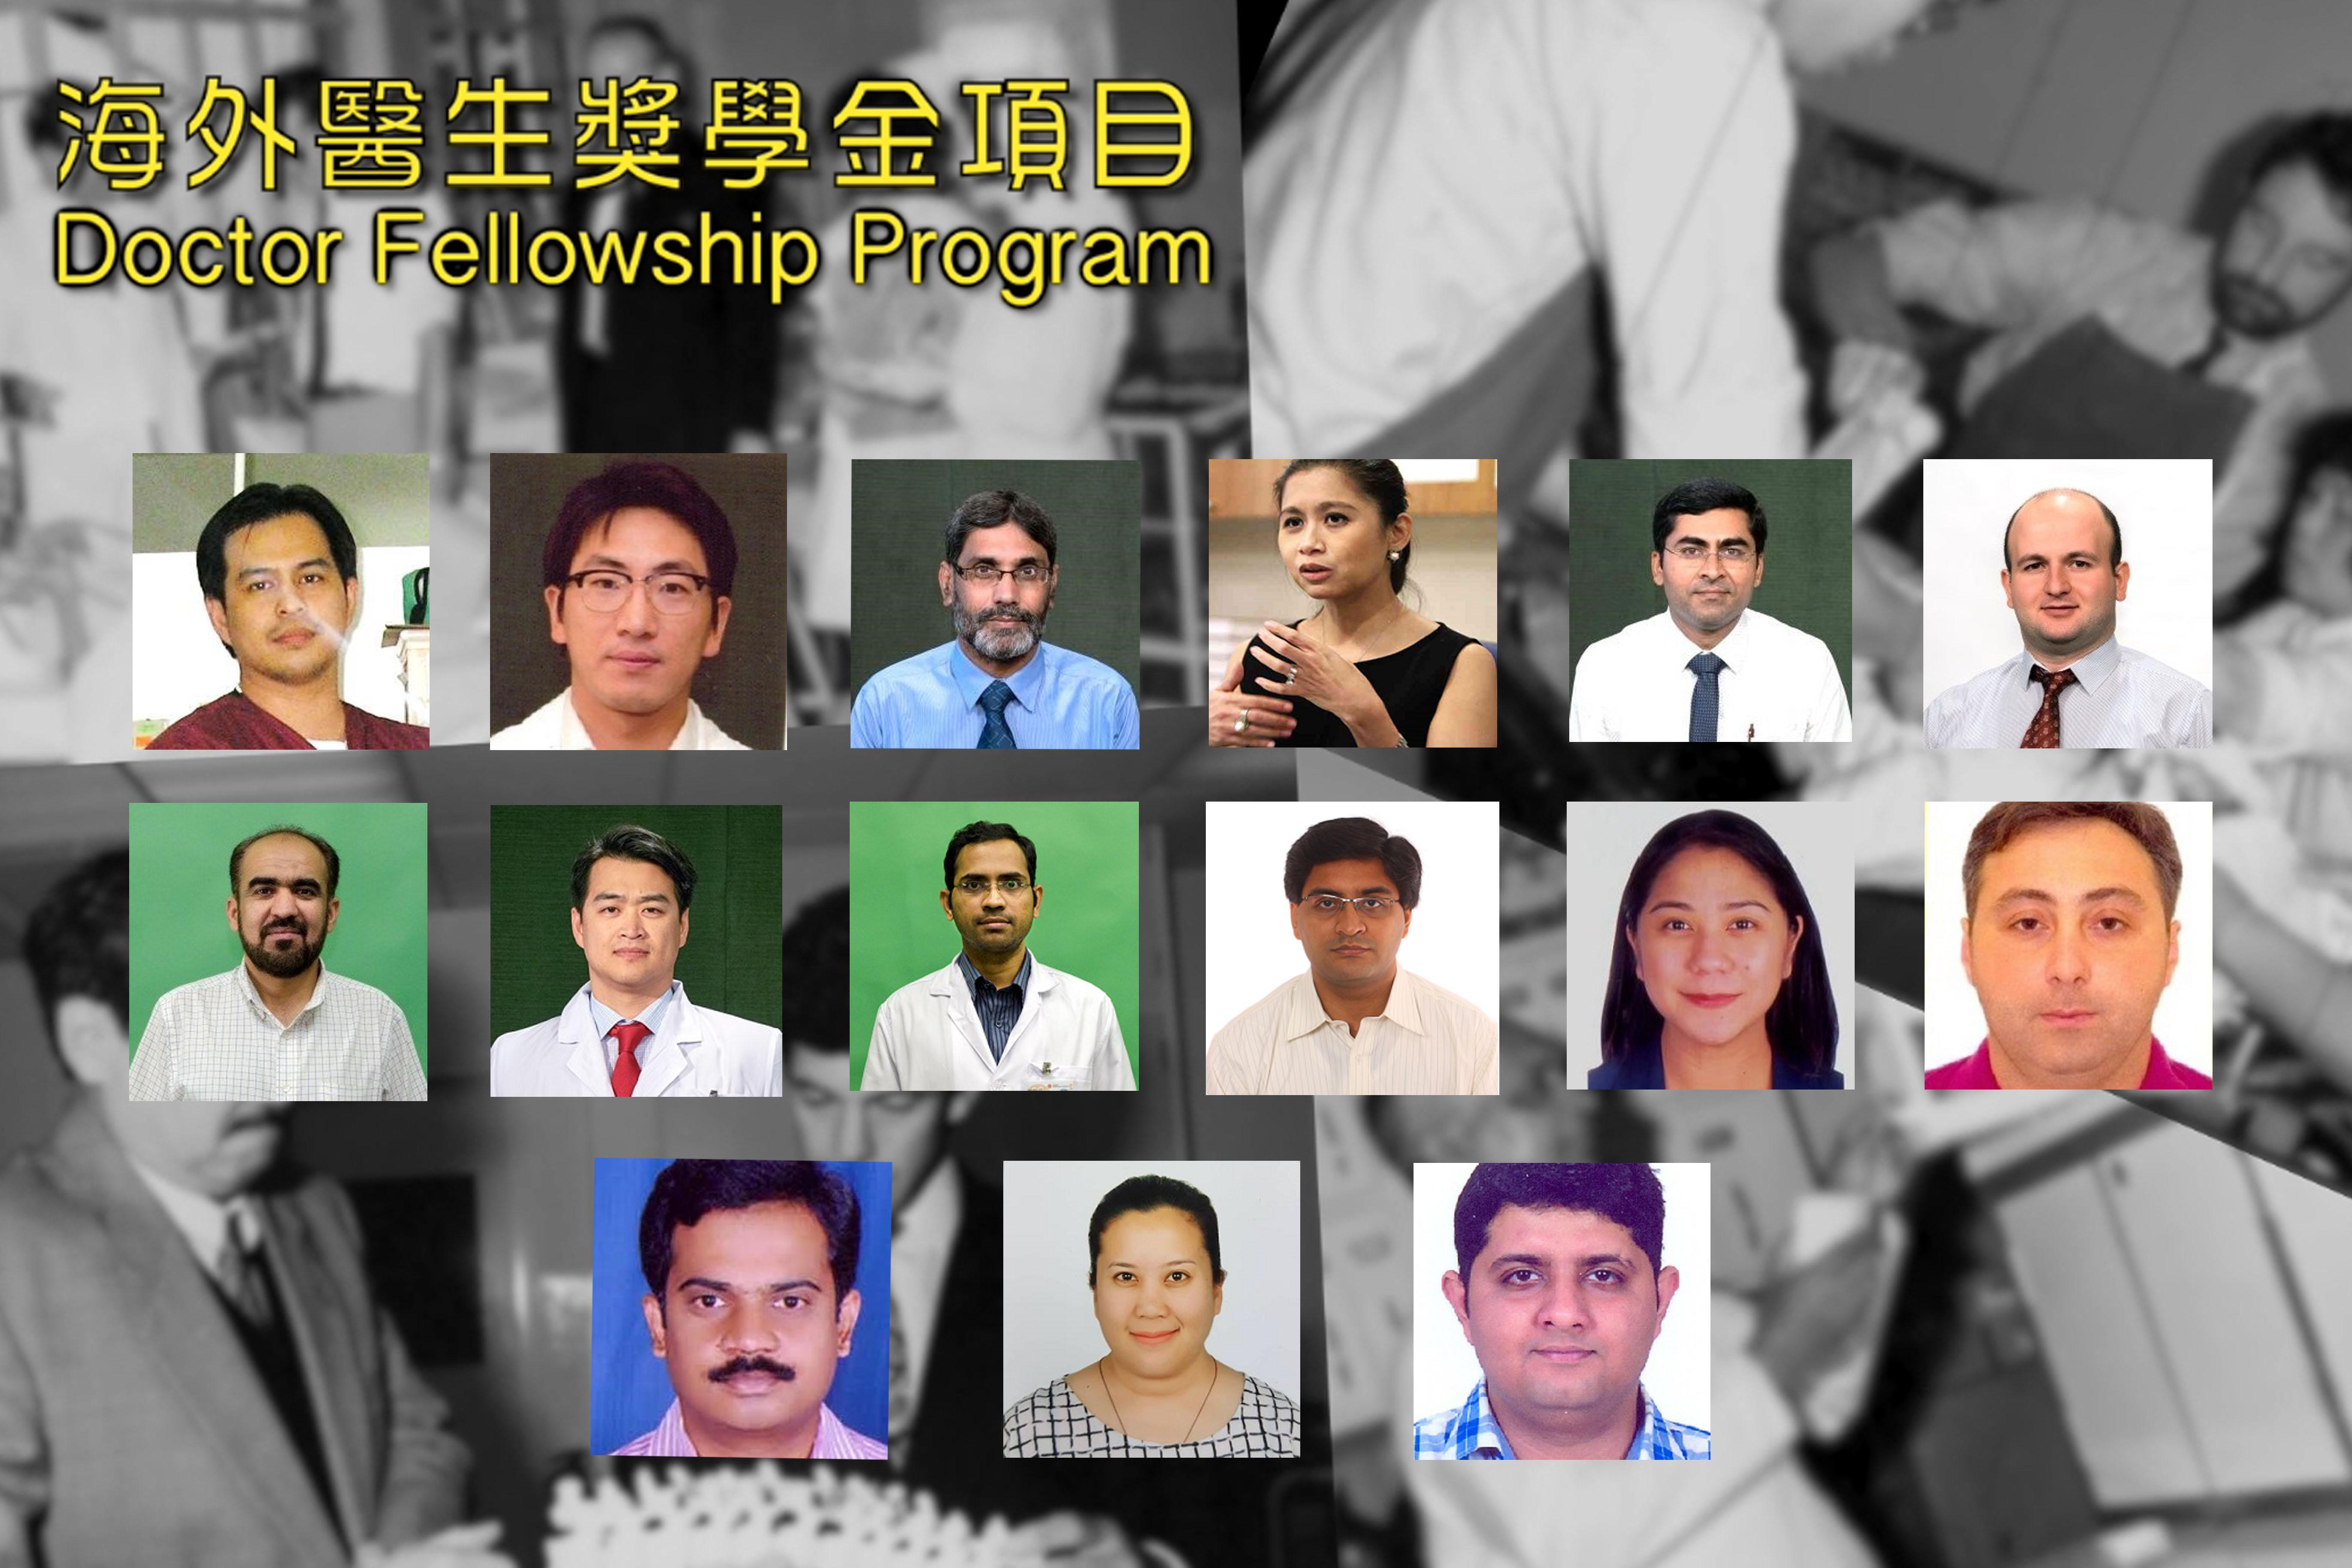 Doctor Fellowship Program 資助海外骨科醫生來港研究計劃